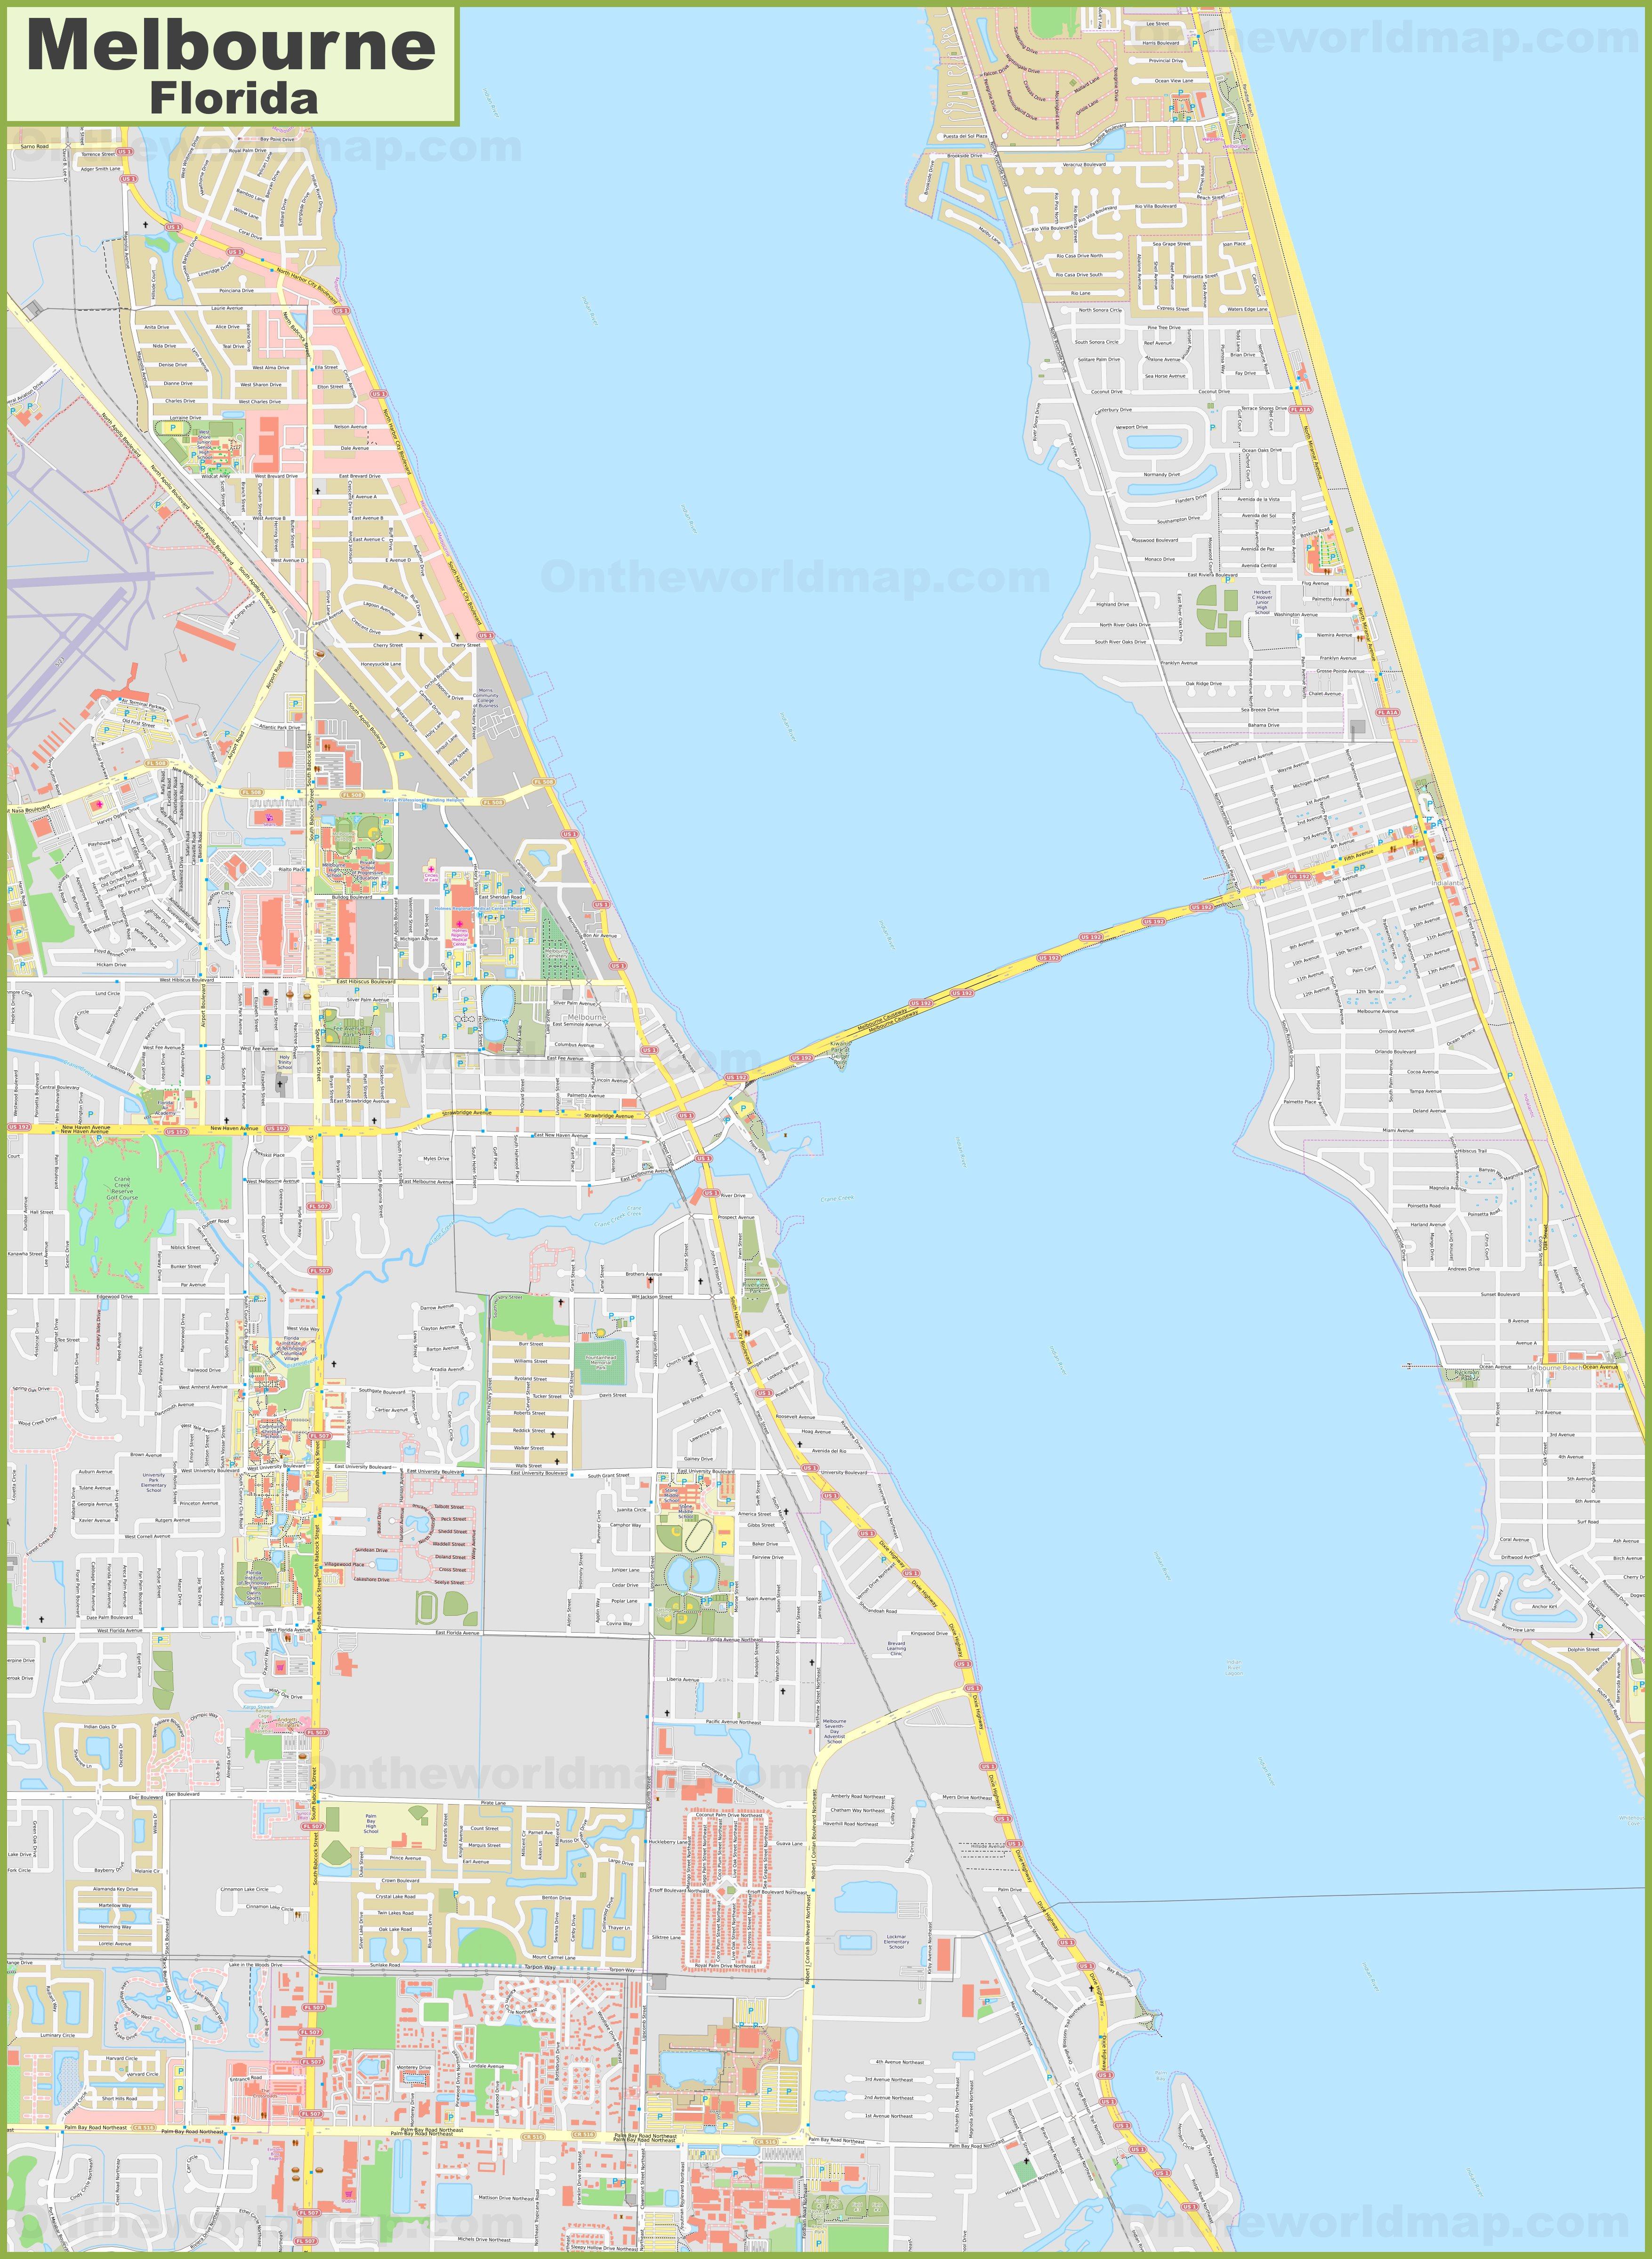 Map Of Florida Melbourne.Large Detailed Map Of Melbourne Florida